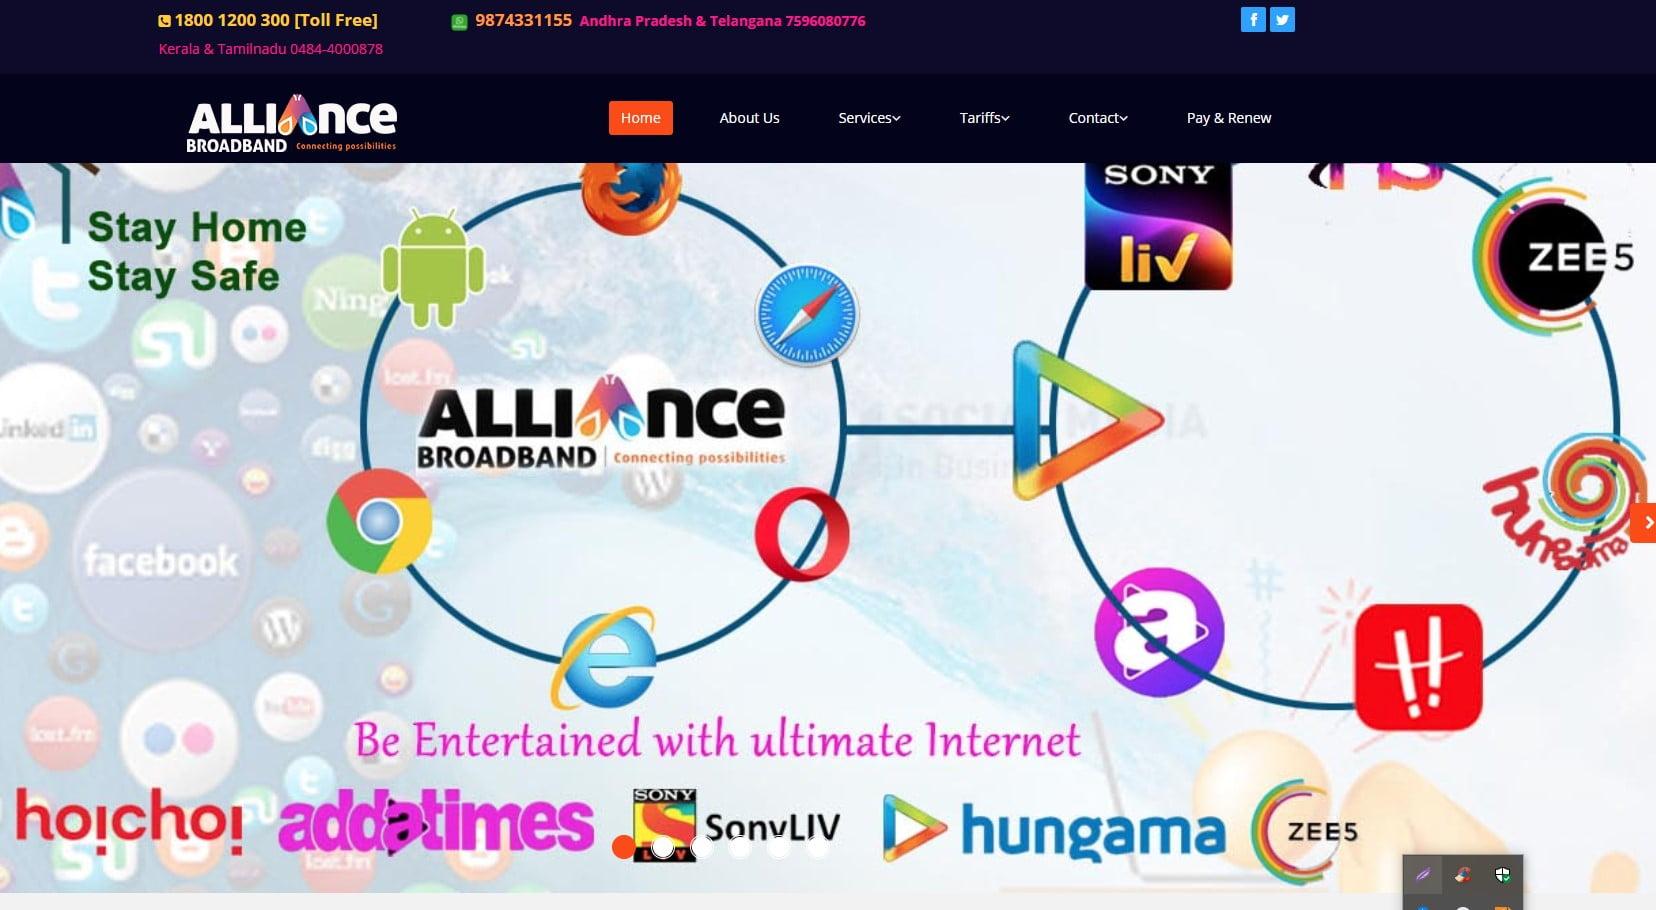 Alliance Broadband